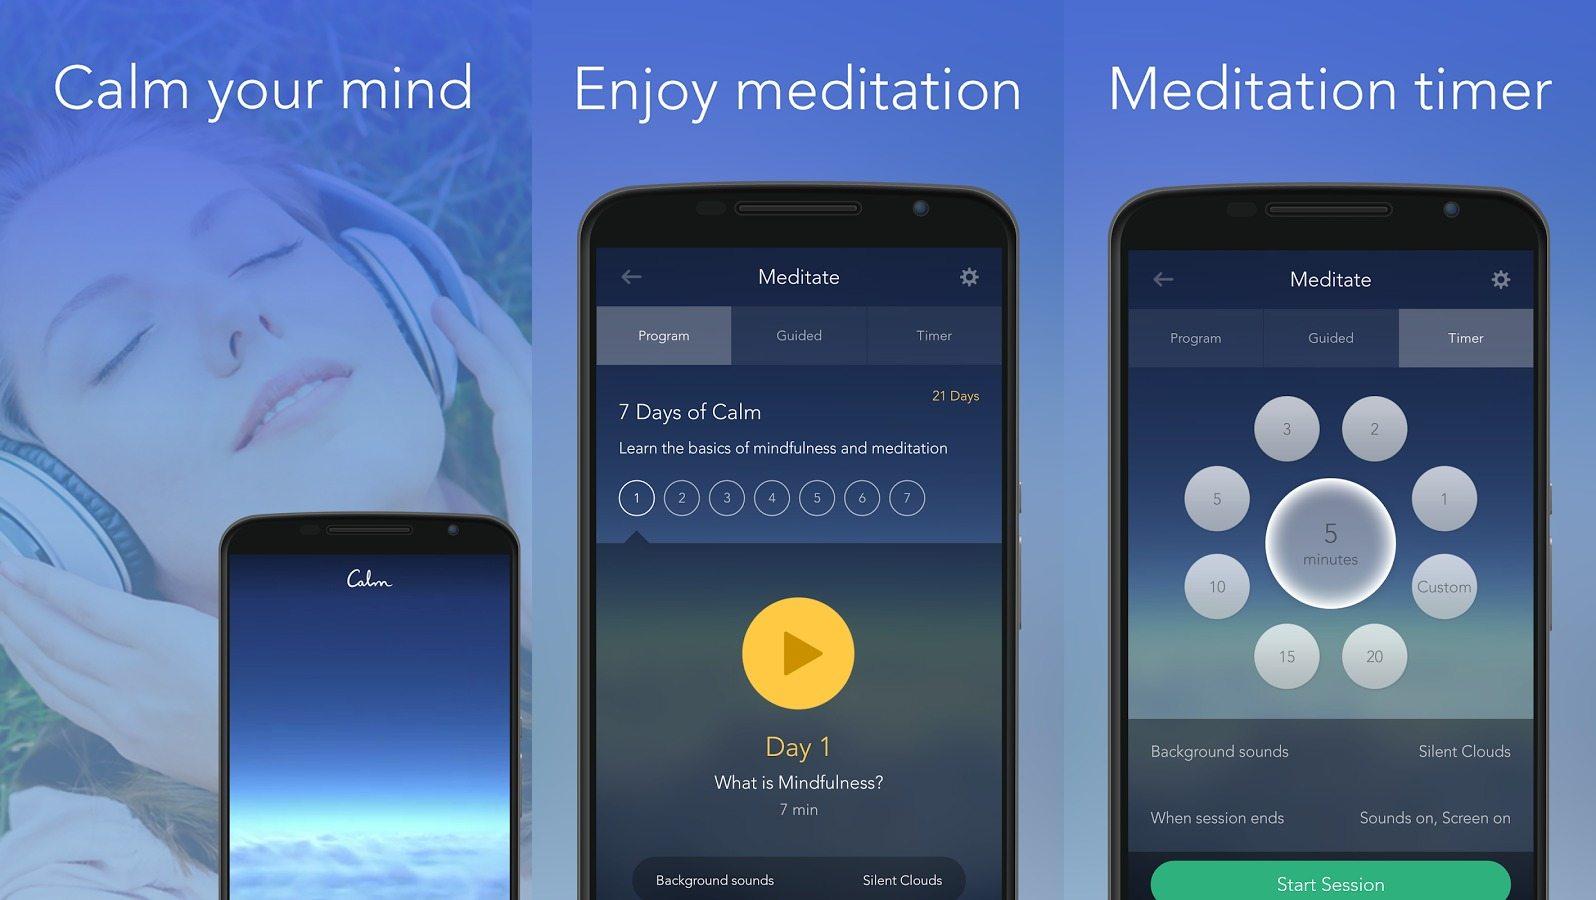 meditating tips android app